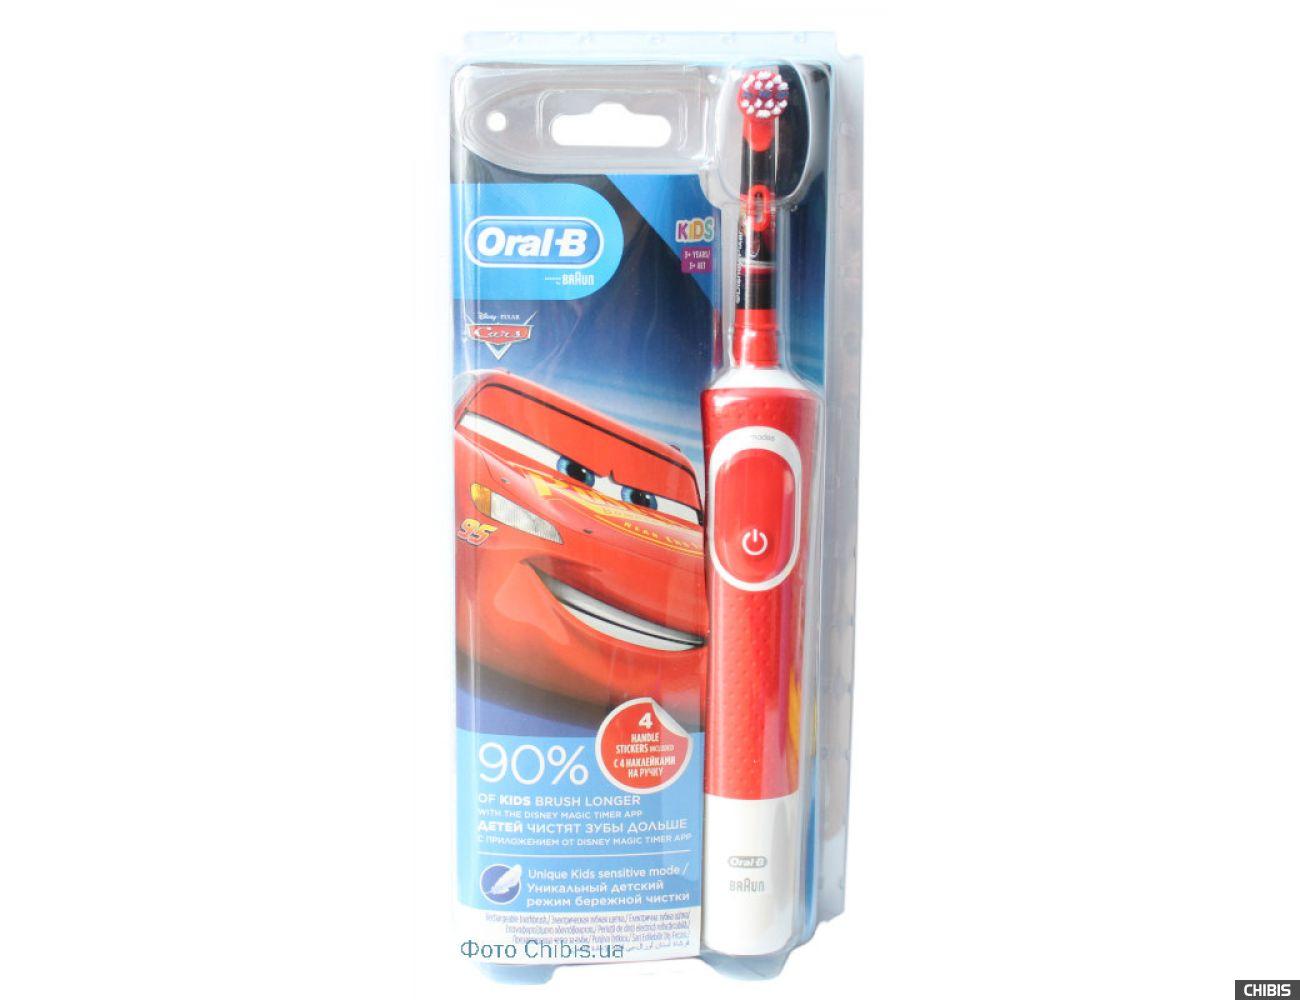 Электрическая щетка Oral B Braun Stages Power D100.413.2K Cars тип 3710 4210201244554